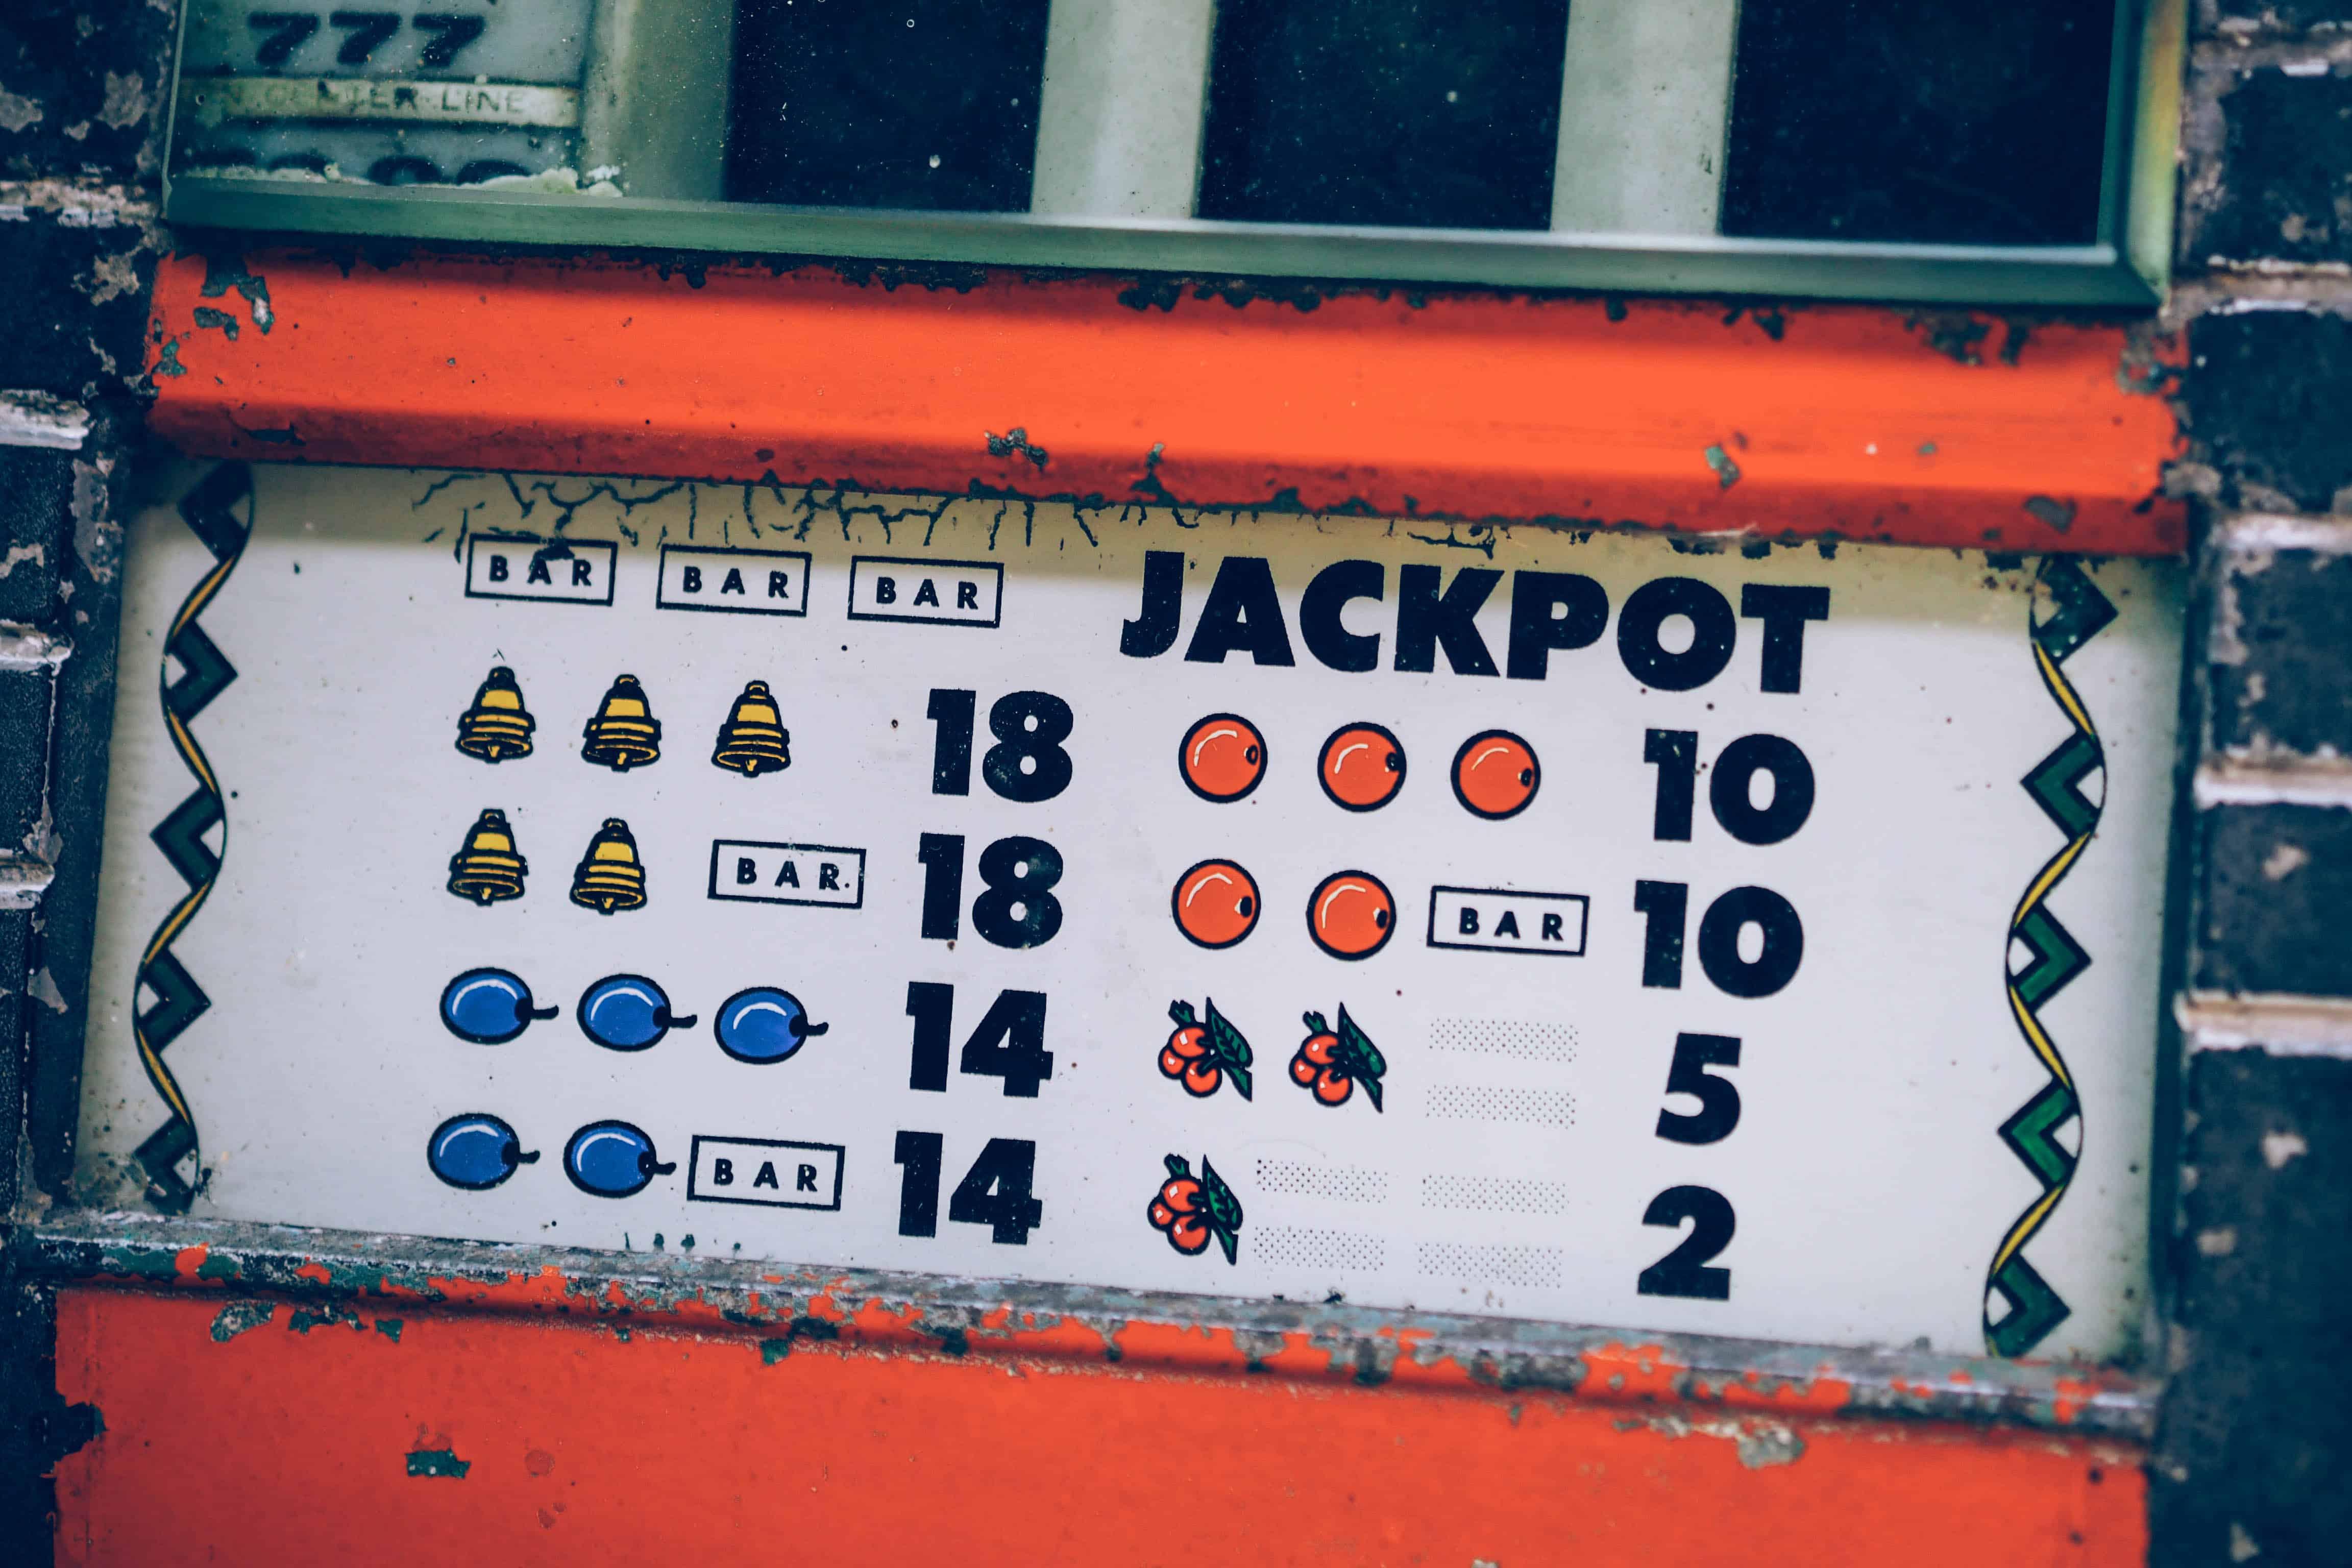 Jackpot (dzekpot) spelu automati